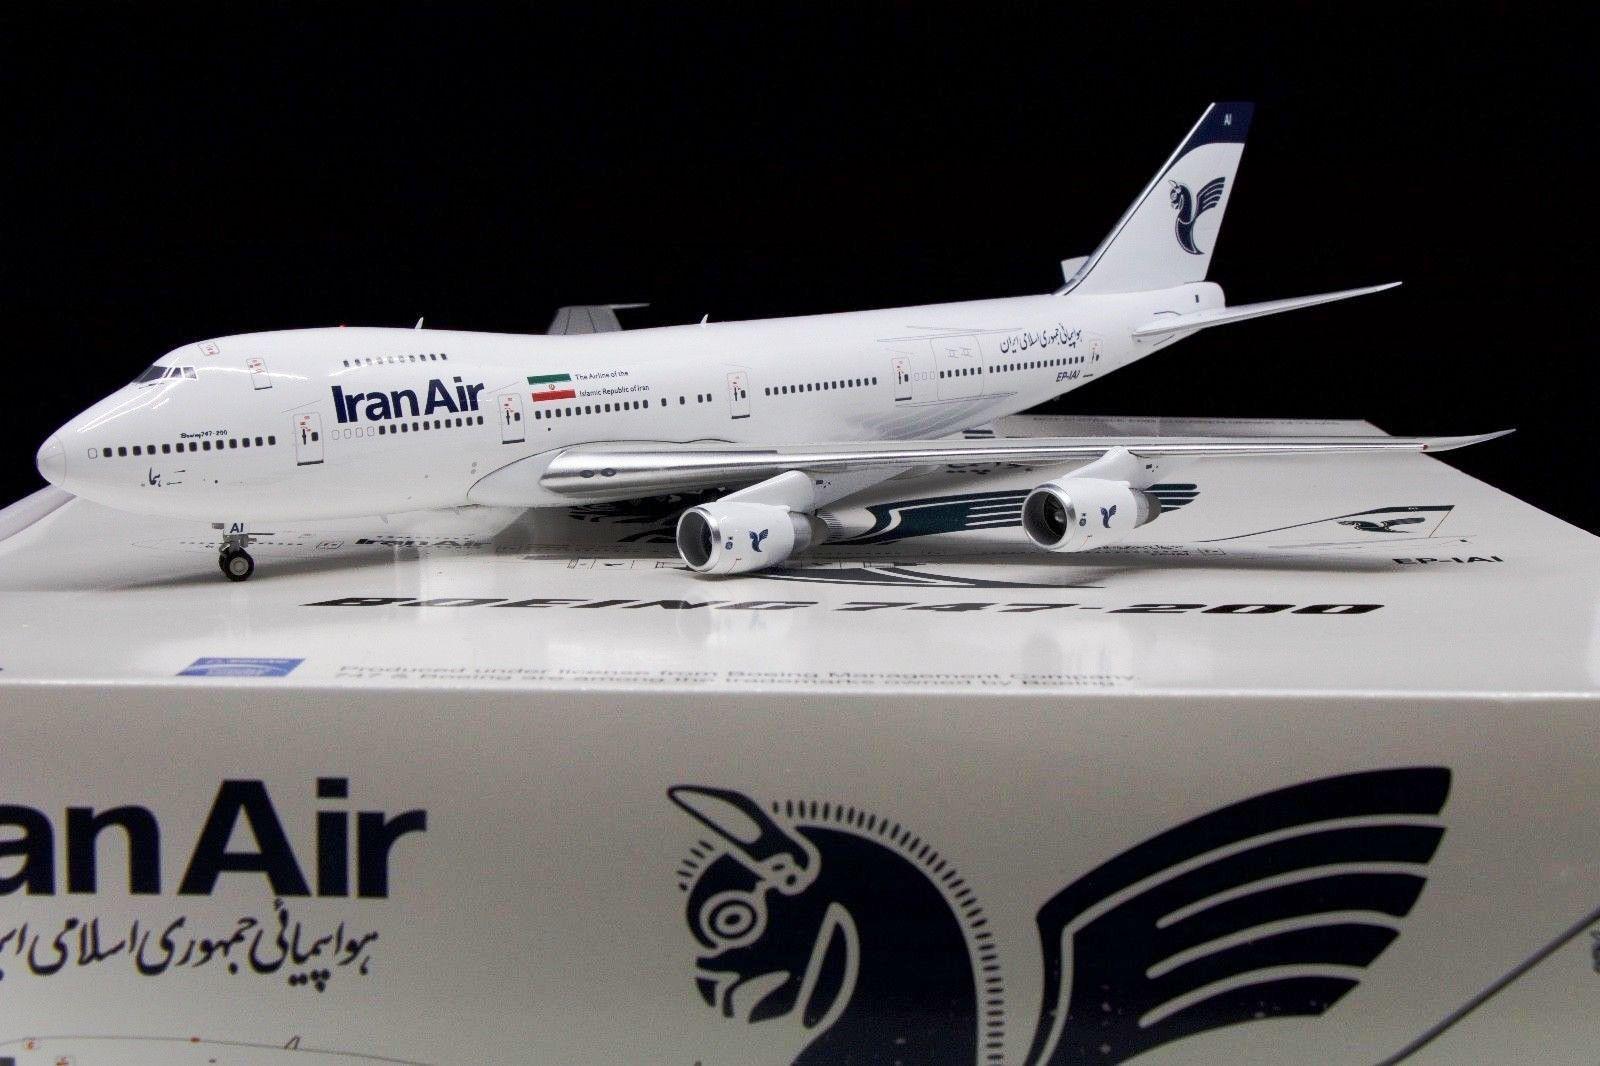 Inflight 200 IF742IR0001 1 200 IRAN AIR BOEING 747-200 EP-IAI avec support